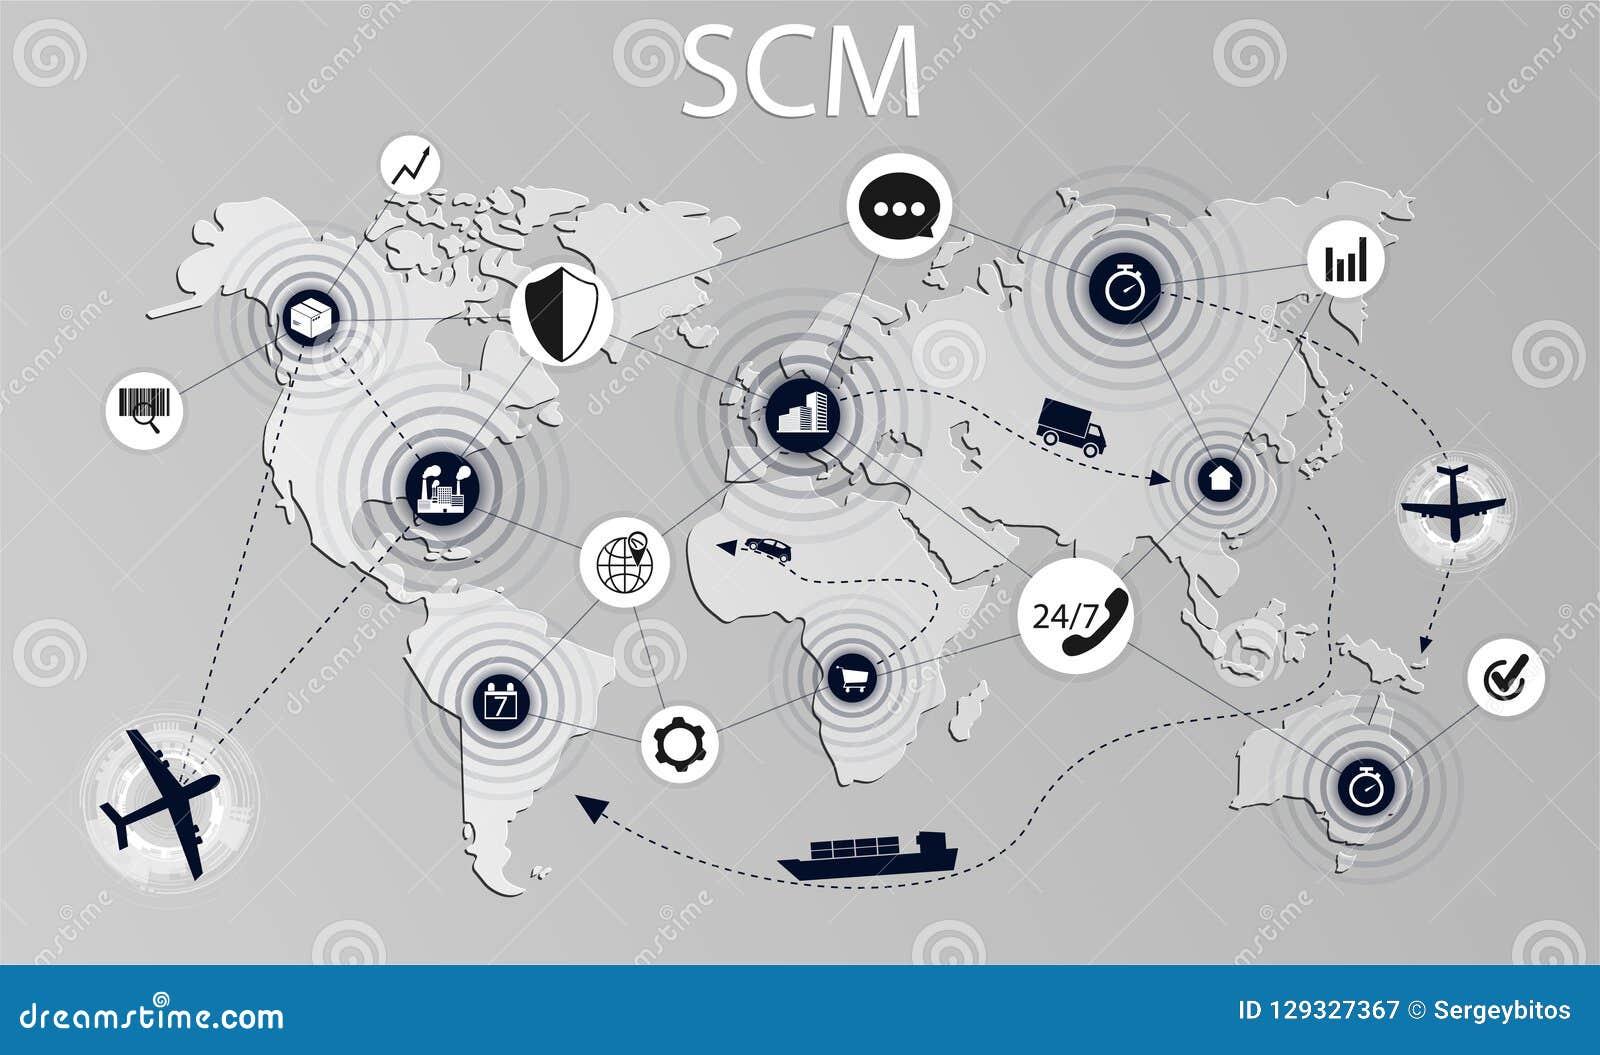 SCM concept illustration